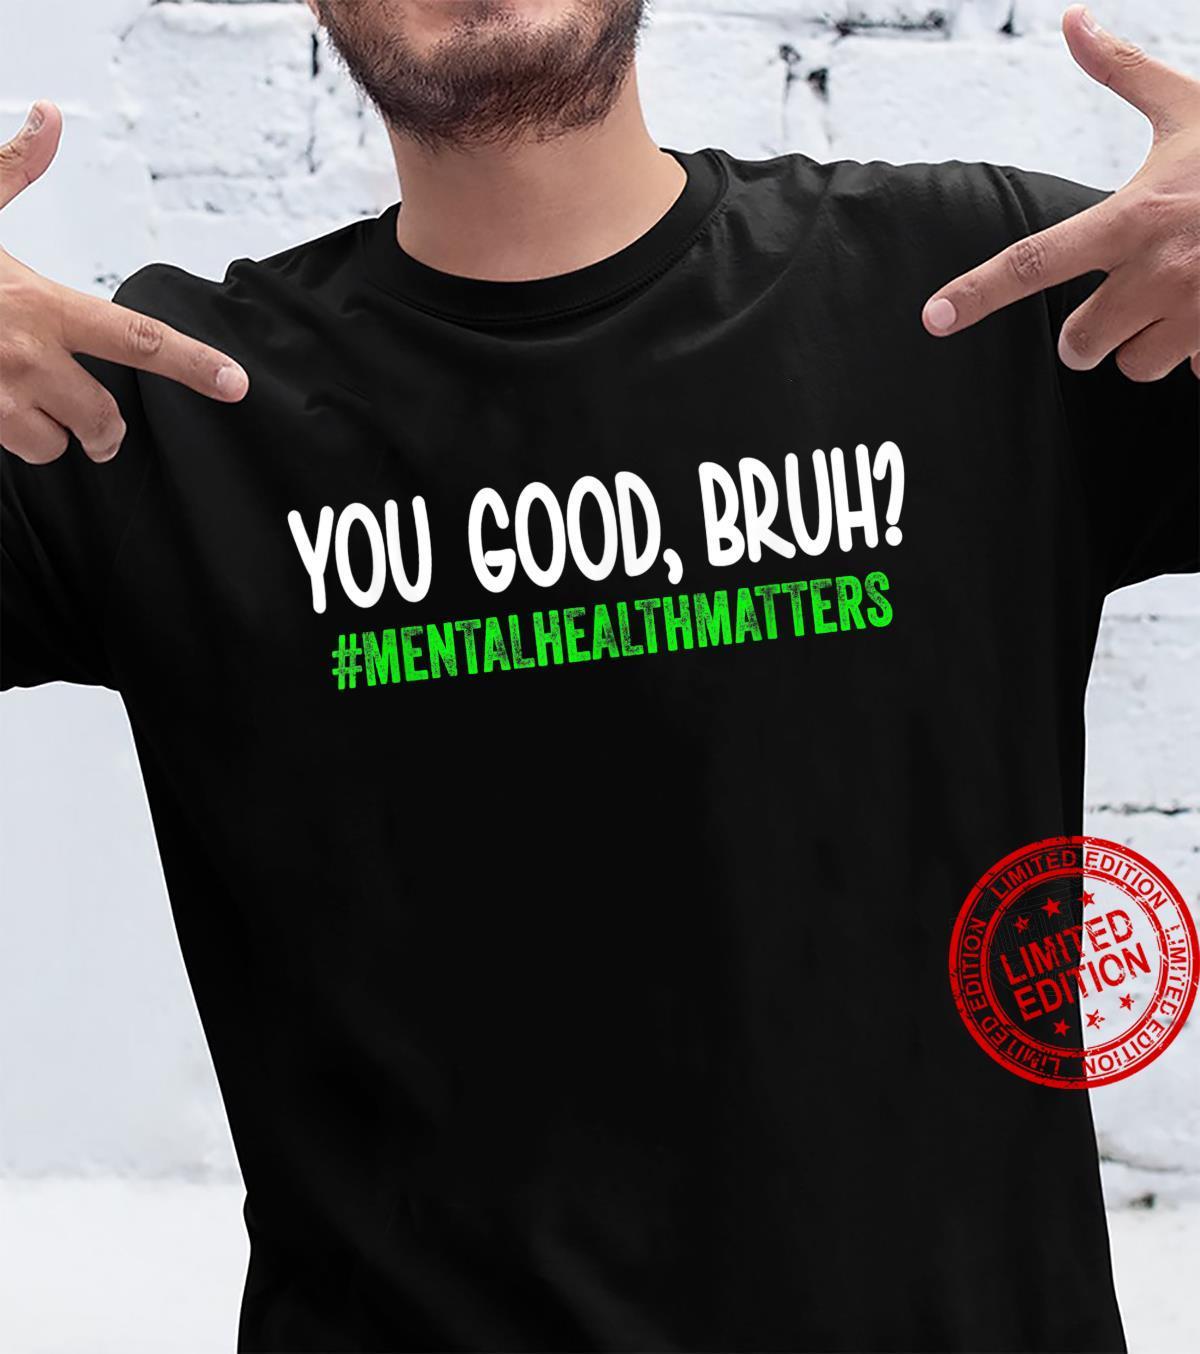 You Good Bruh Mental Health Matters tal Health Matters Shirt